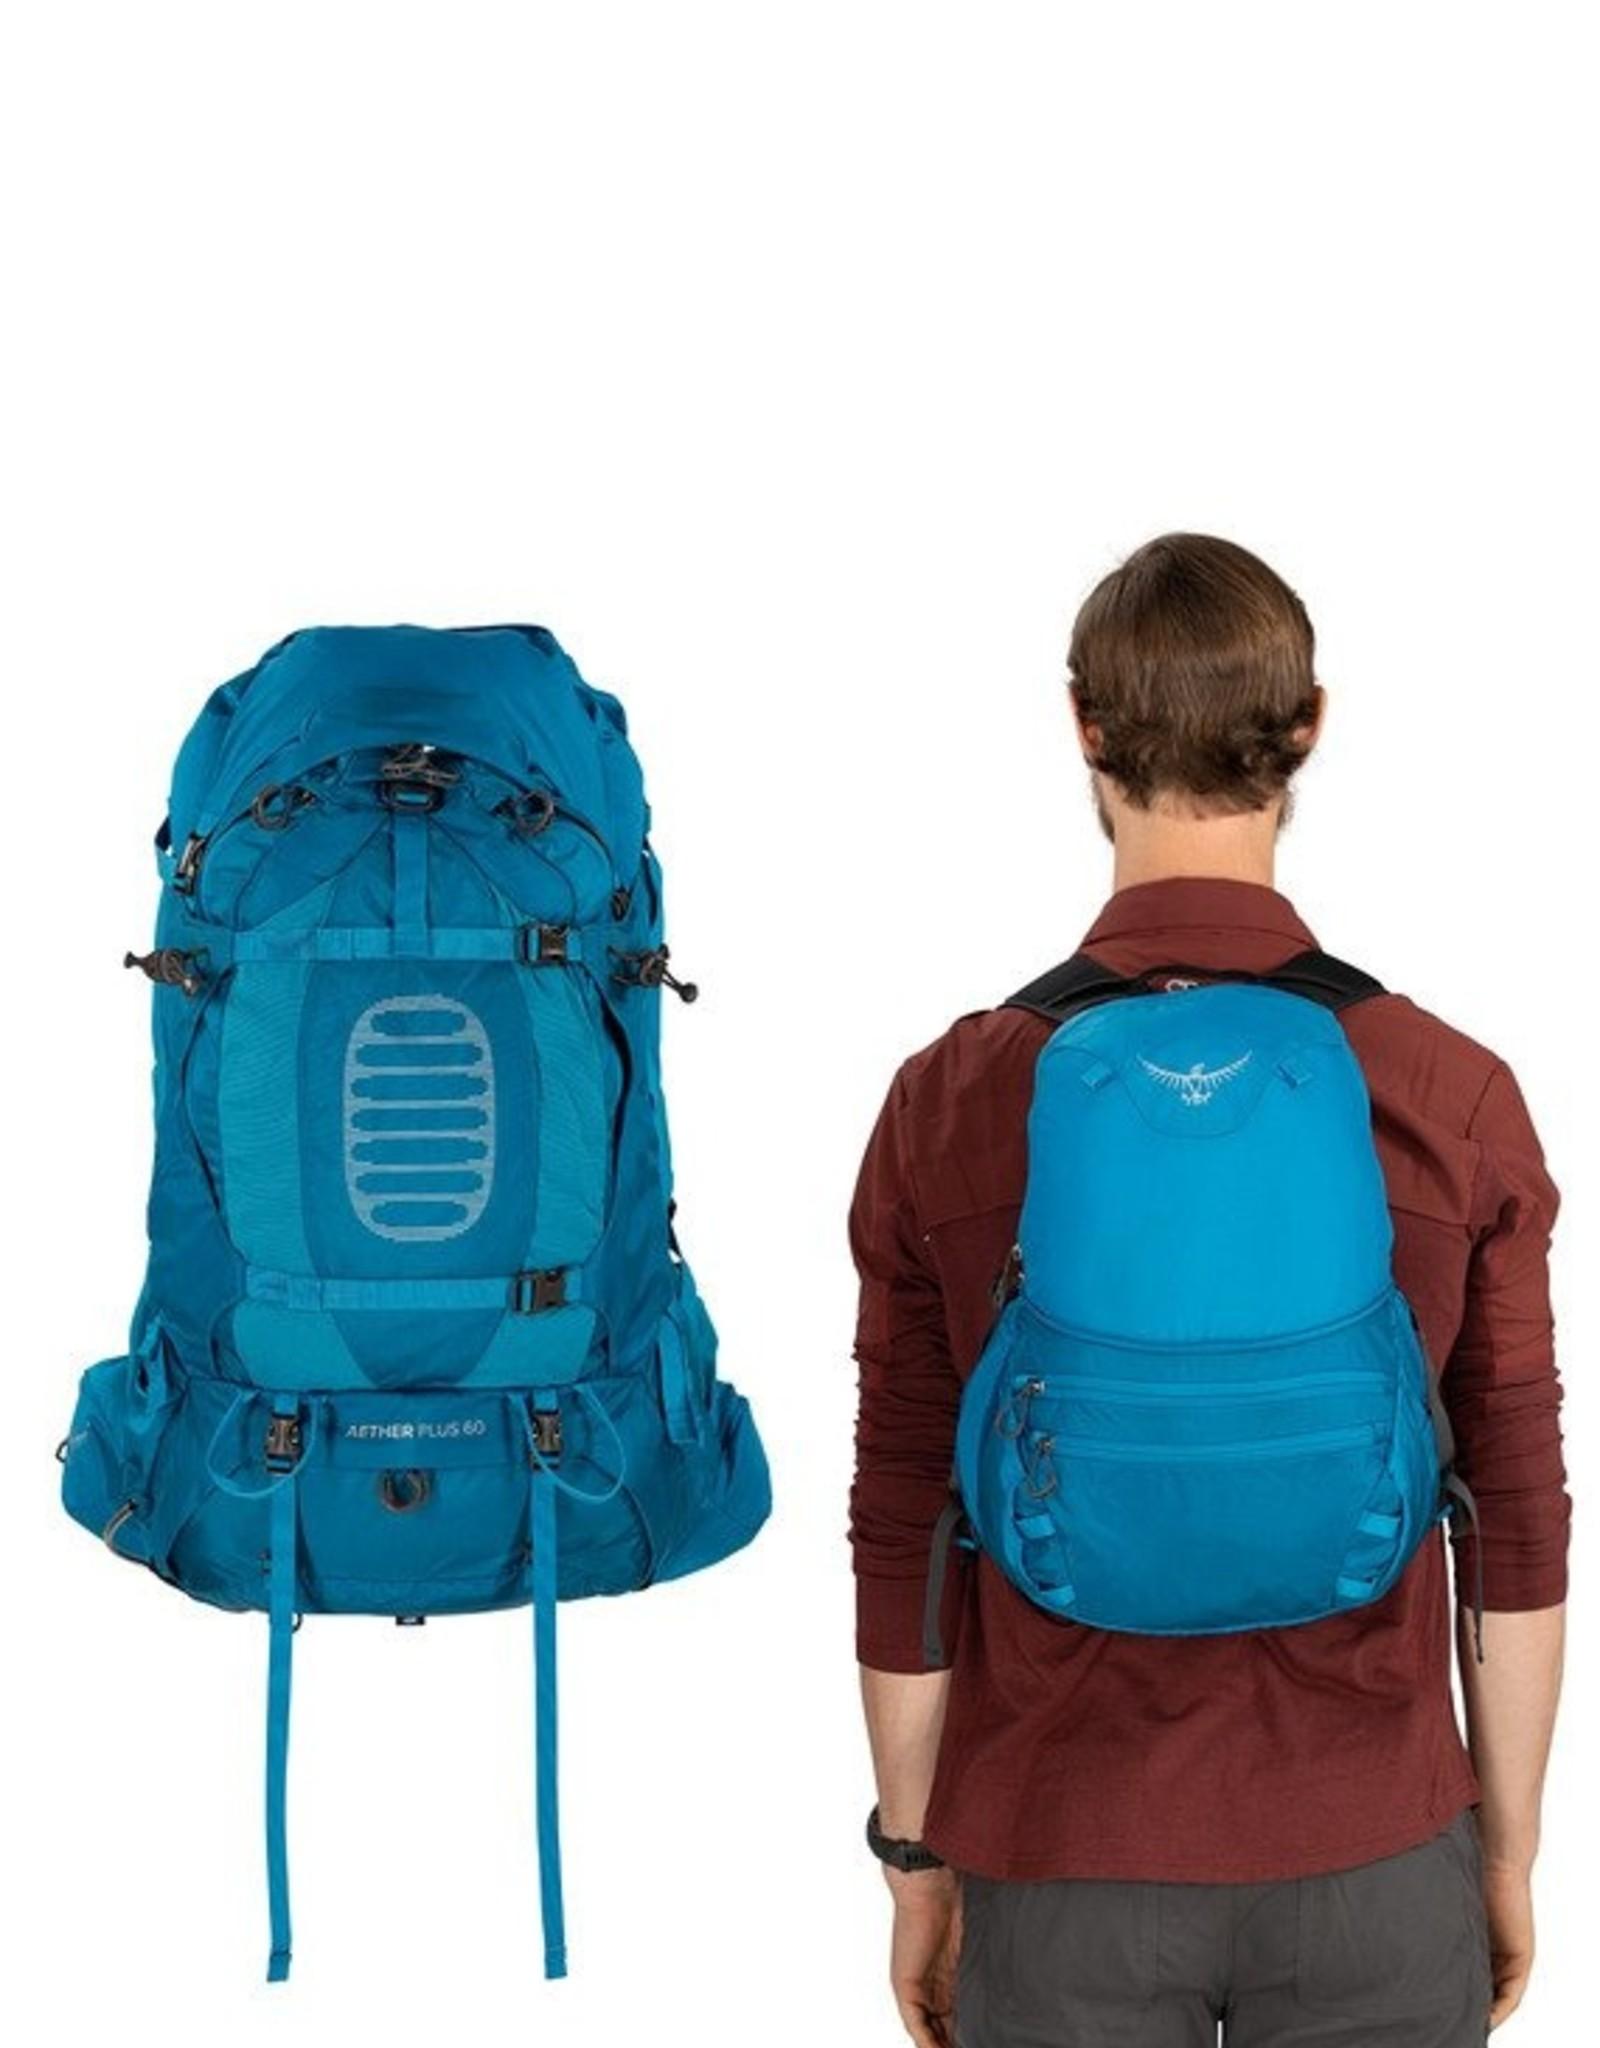 Osprey Osprey Aether Plus 60 Backpacking Pack